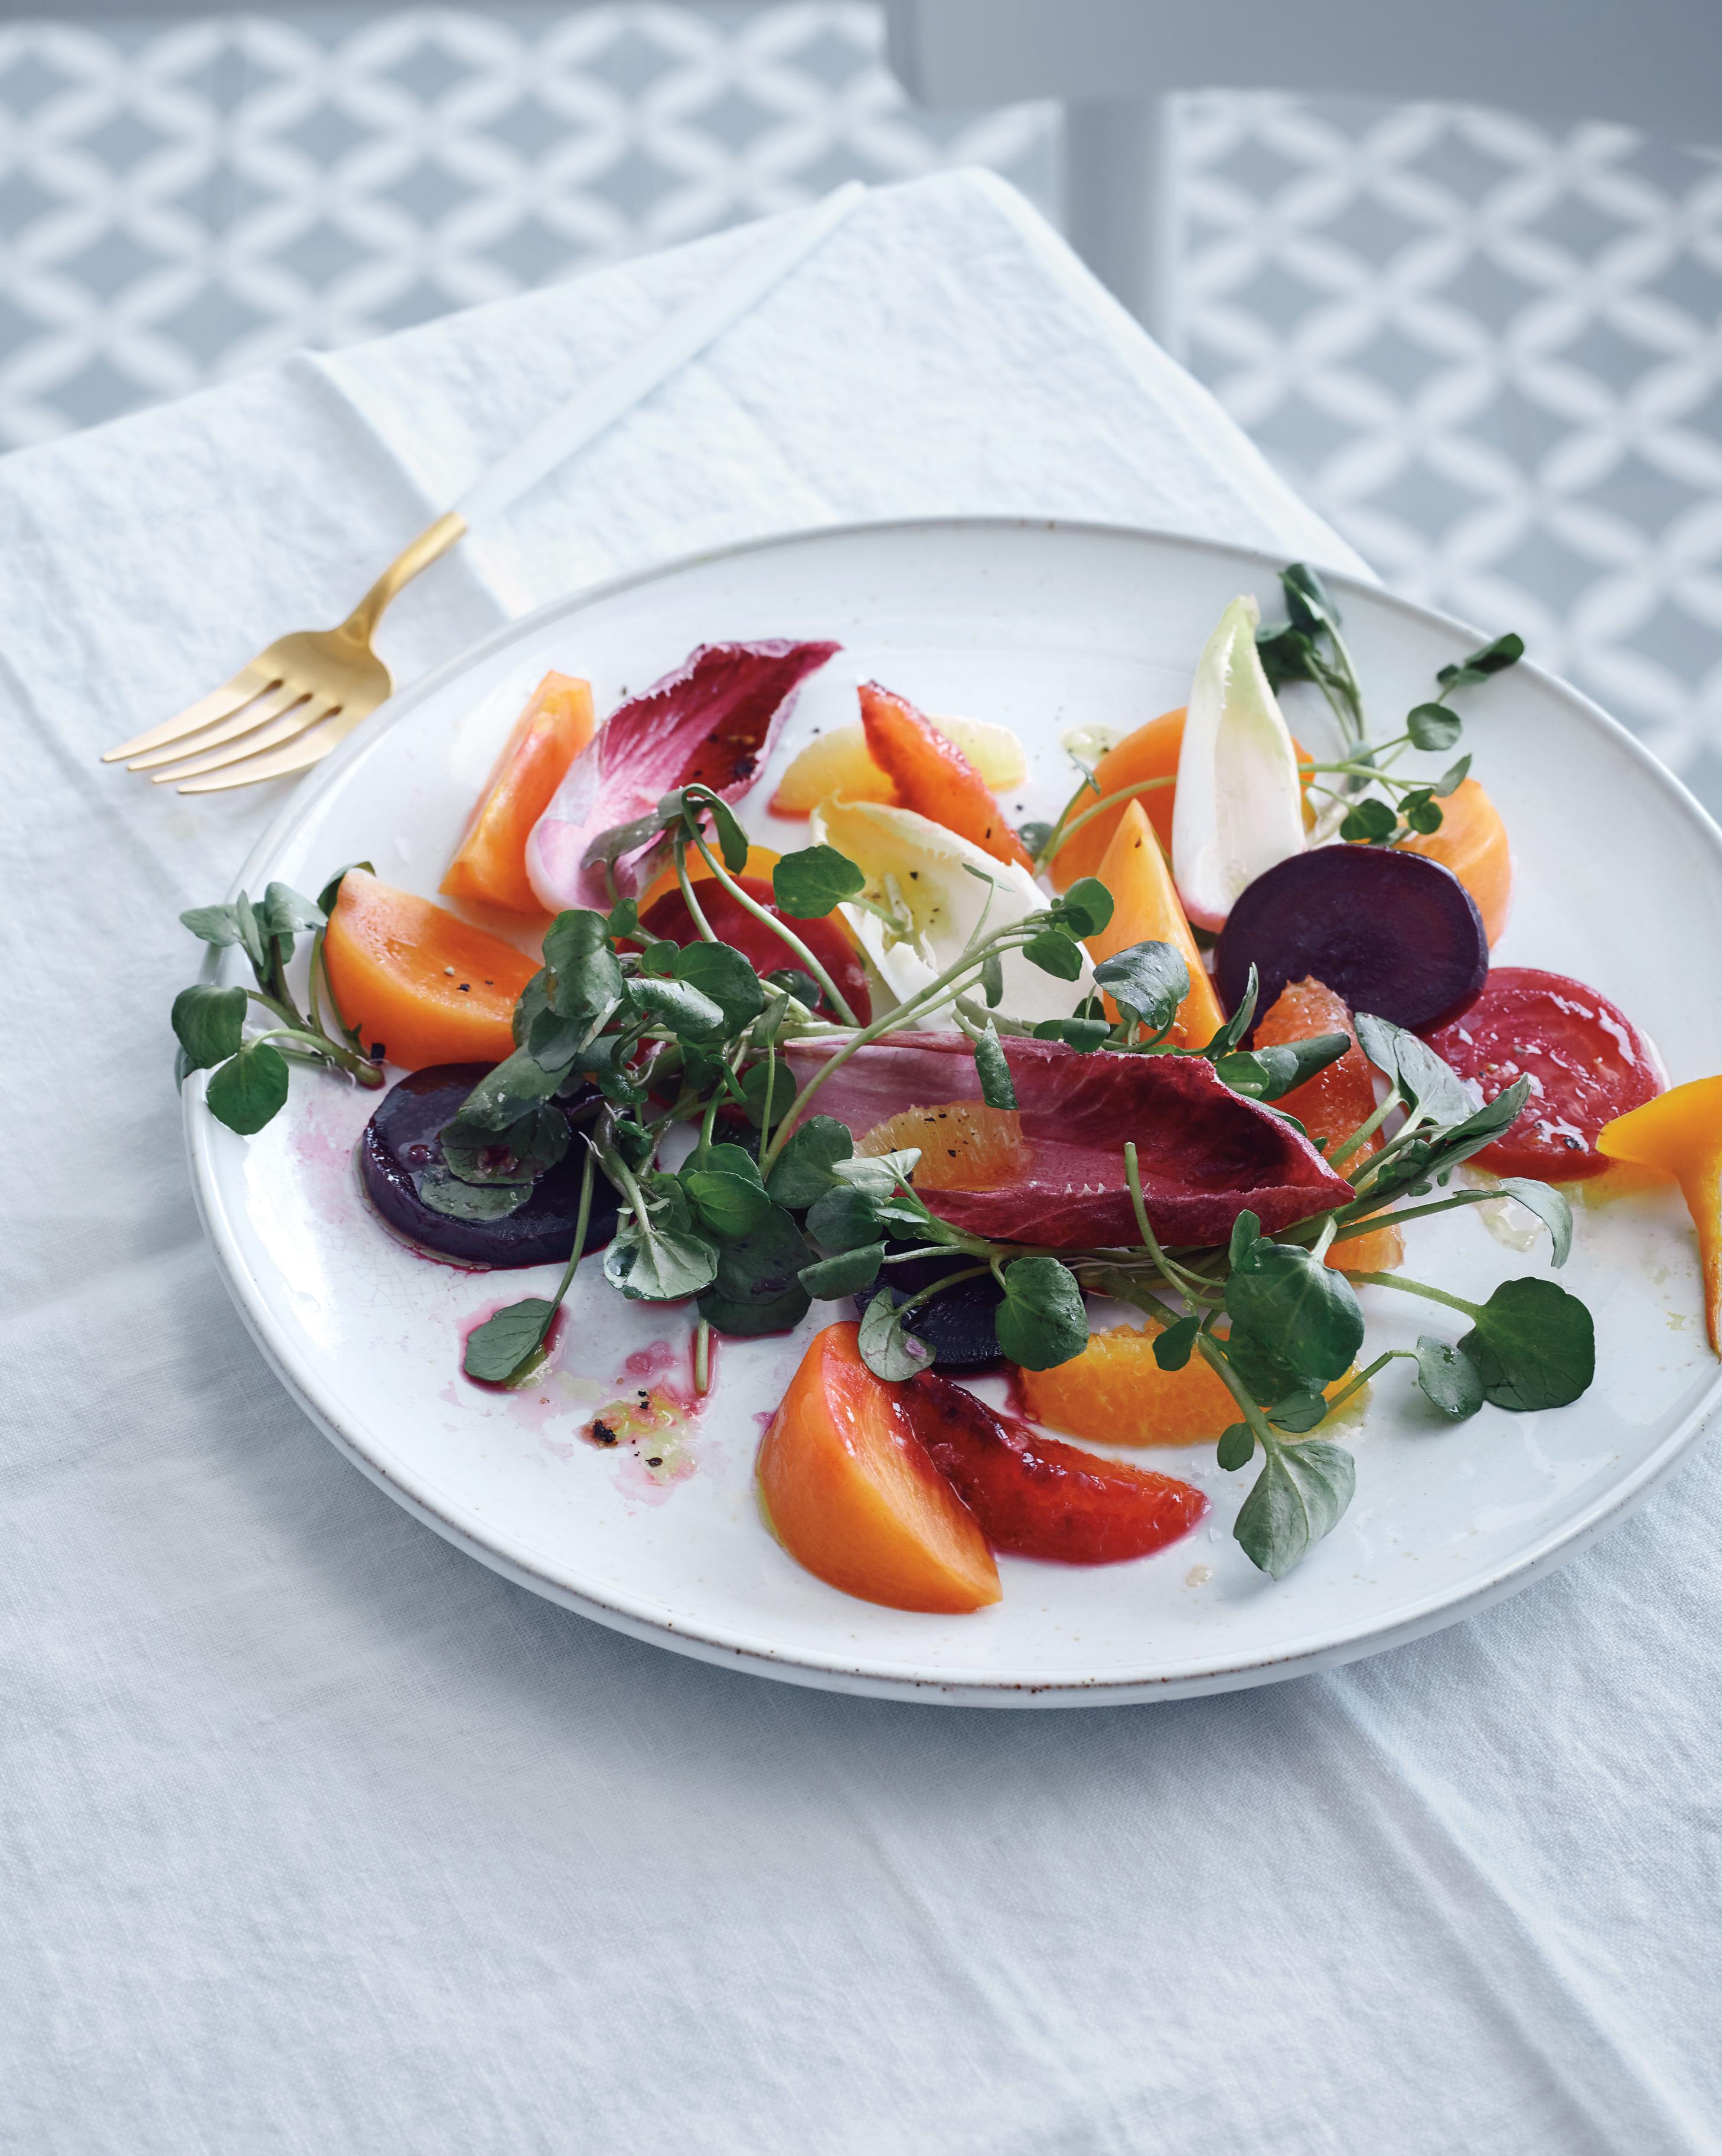 Persimmon, Beet, and Citrus Salad